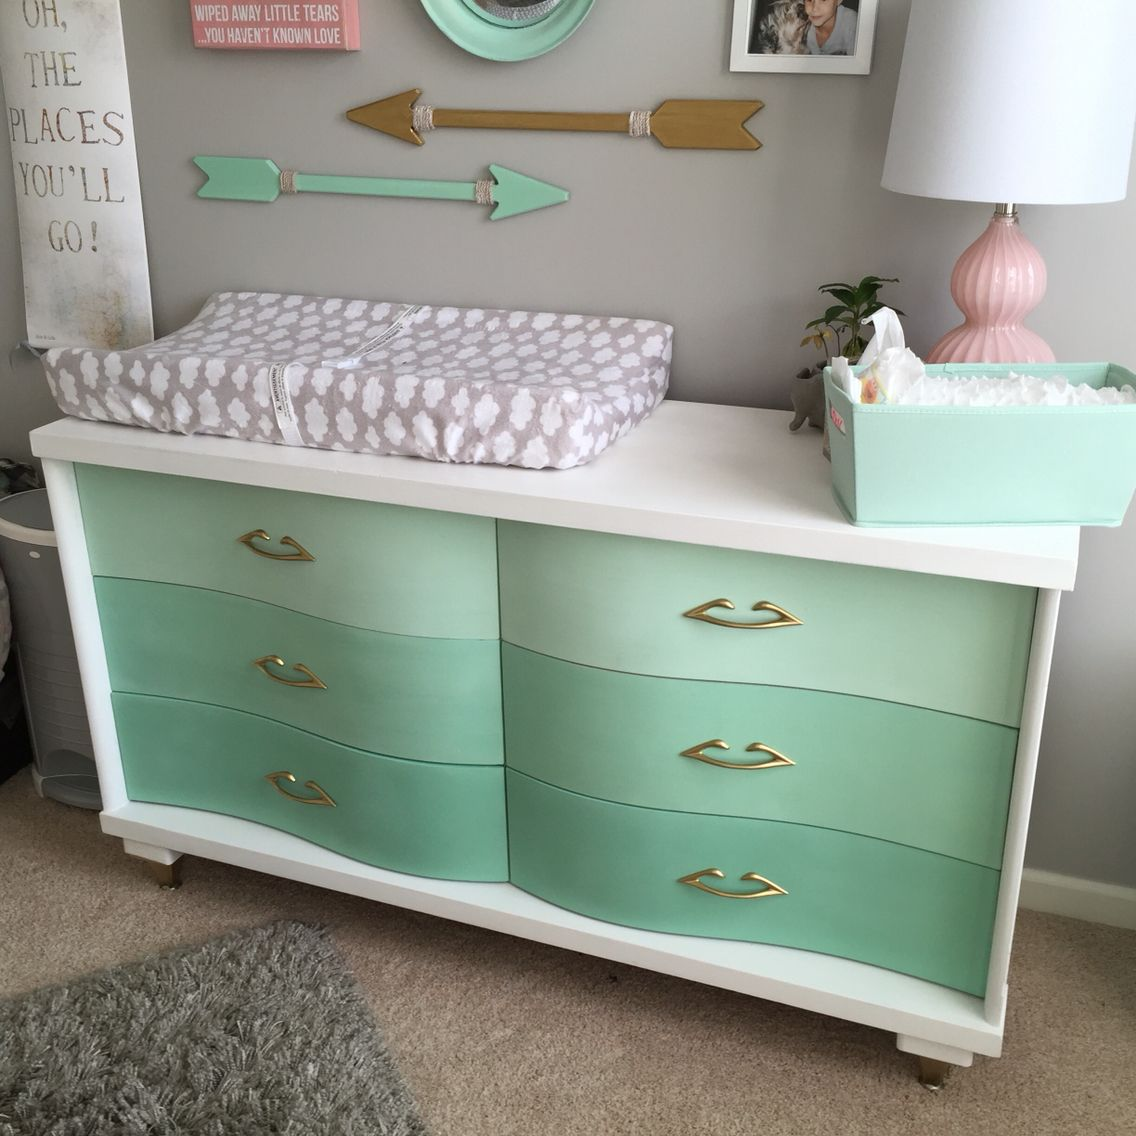 Beautiful vintage dresser redone in Annie Sloan chalk paint ombré ...